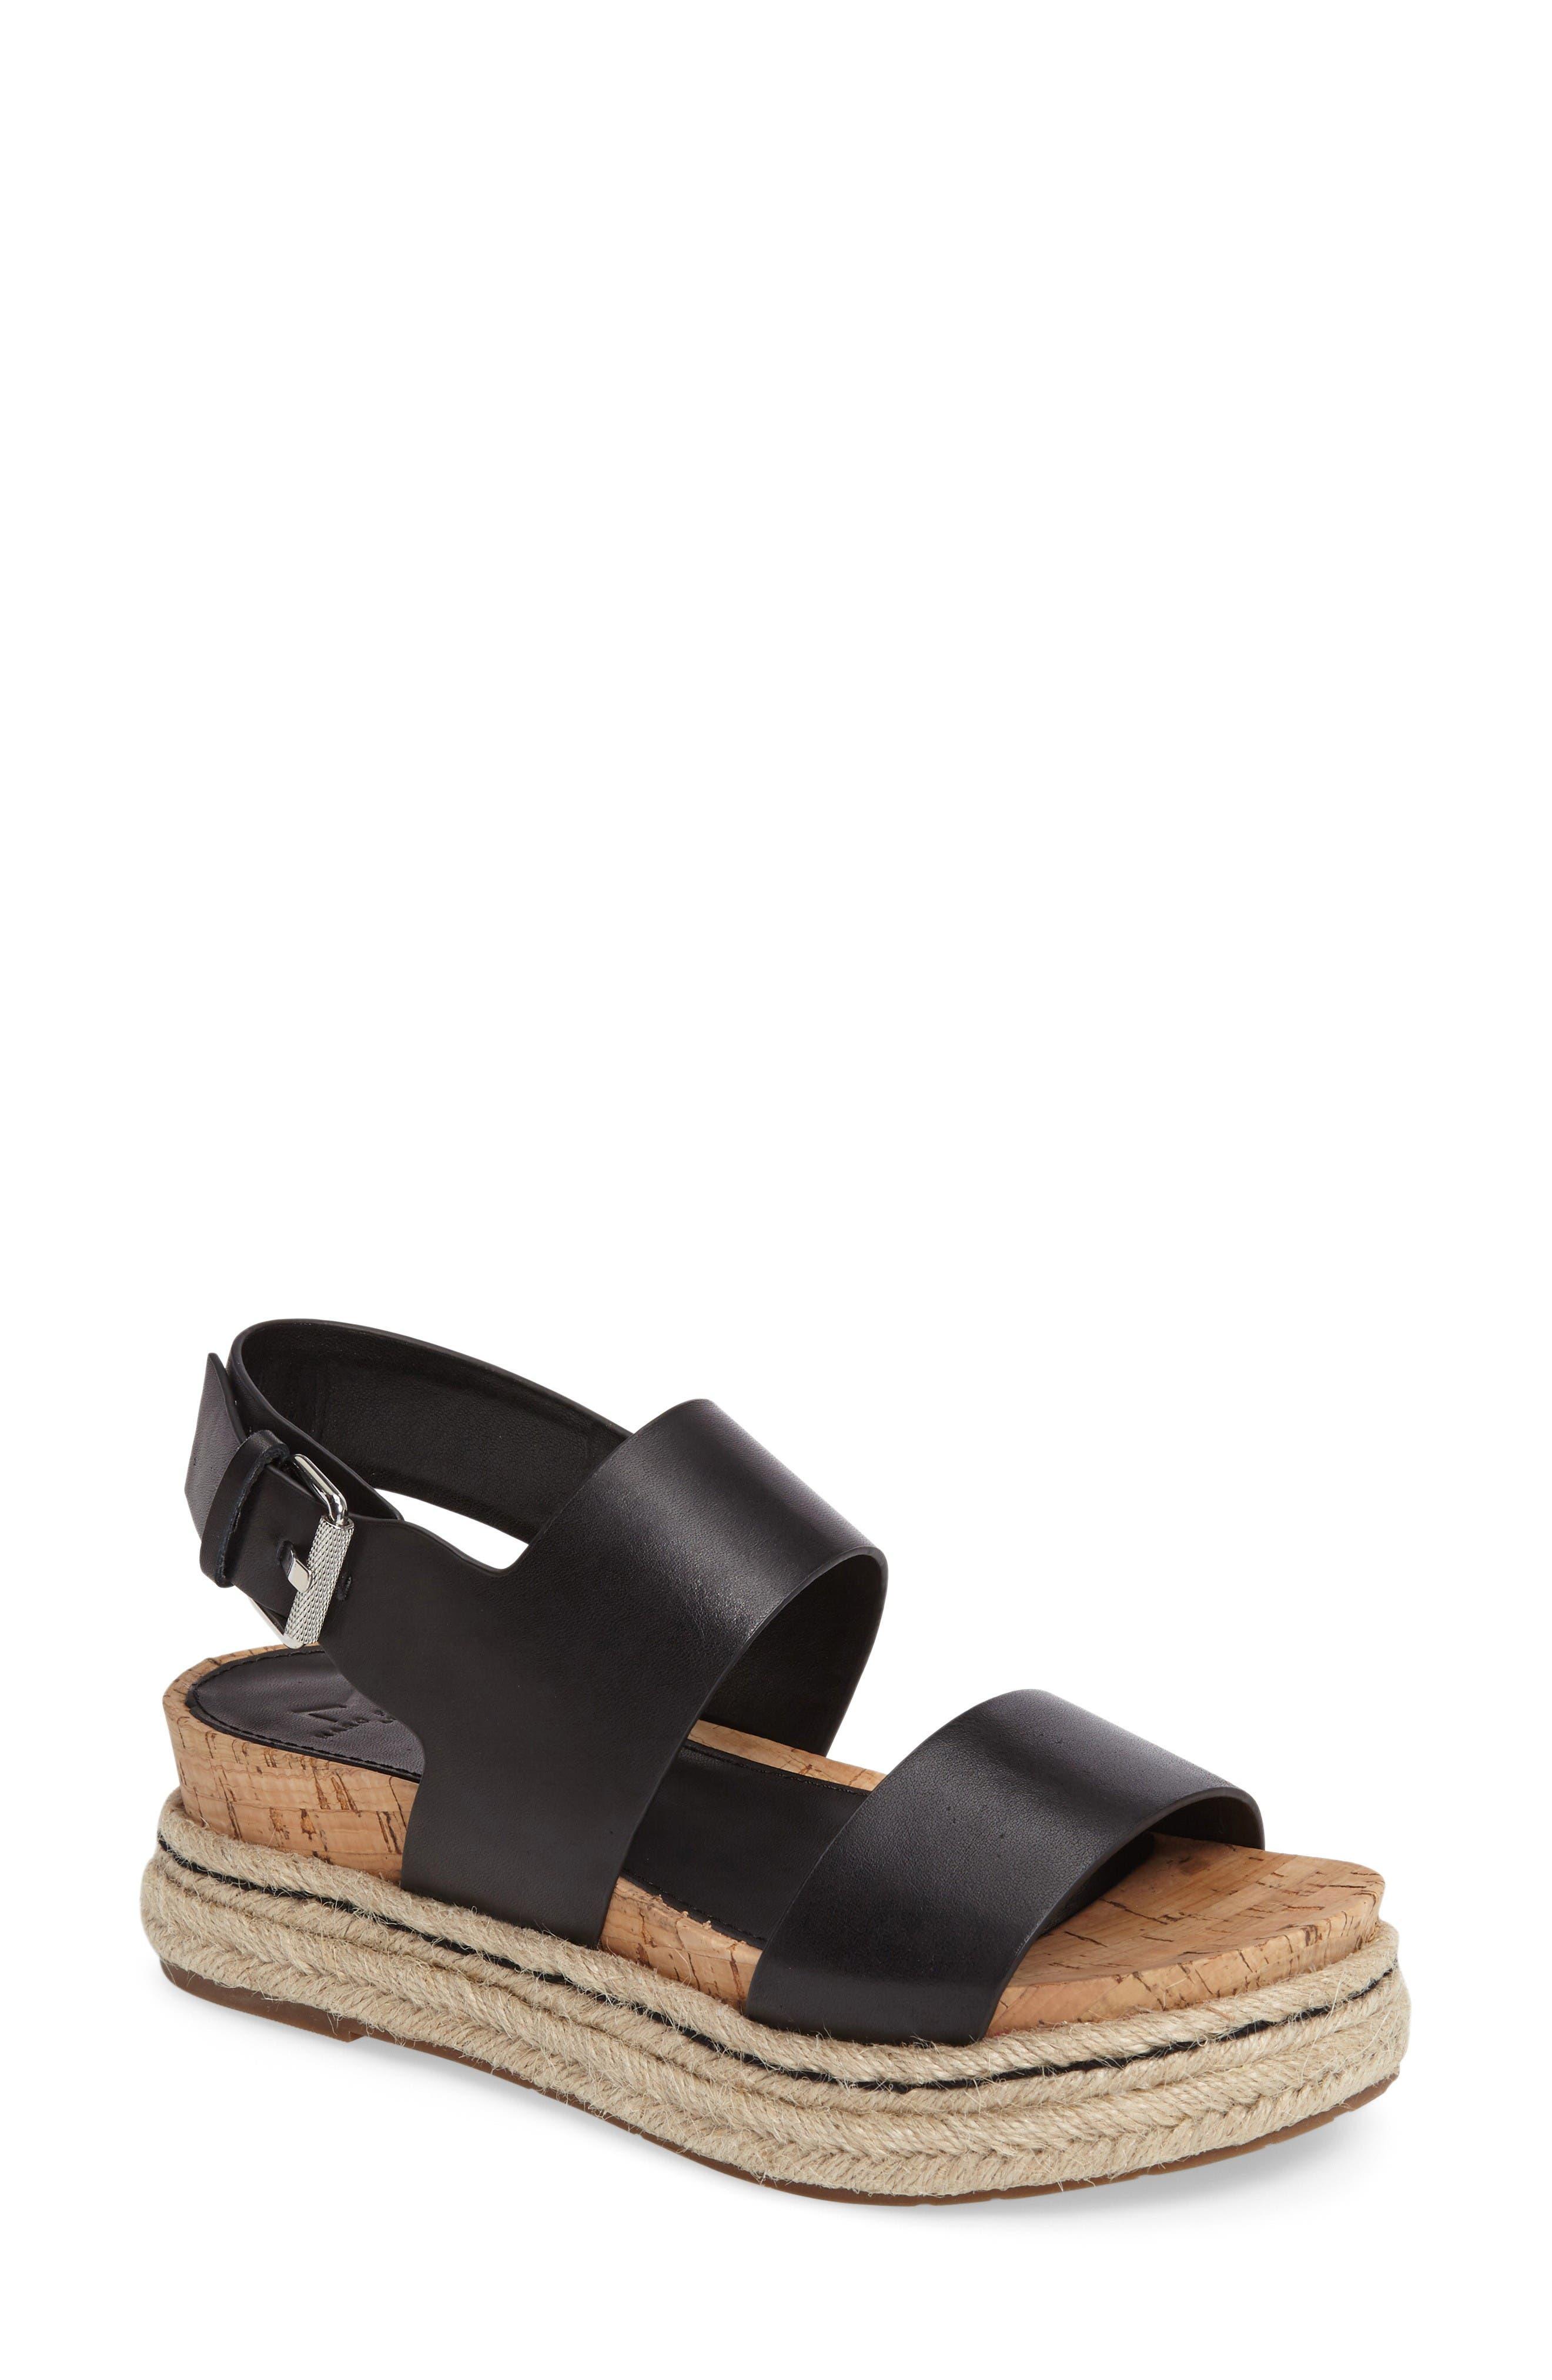 Marc Fisher LTD Oria Espadrille Platform Sandal (Women)